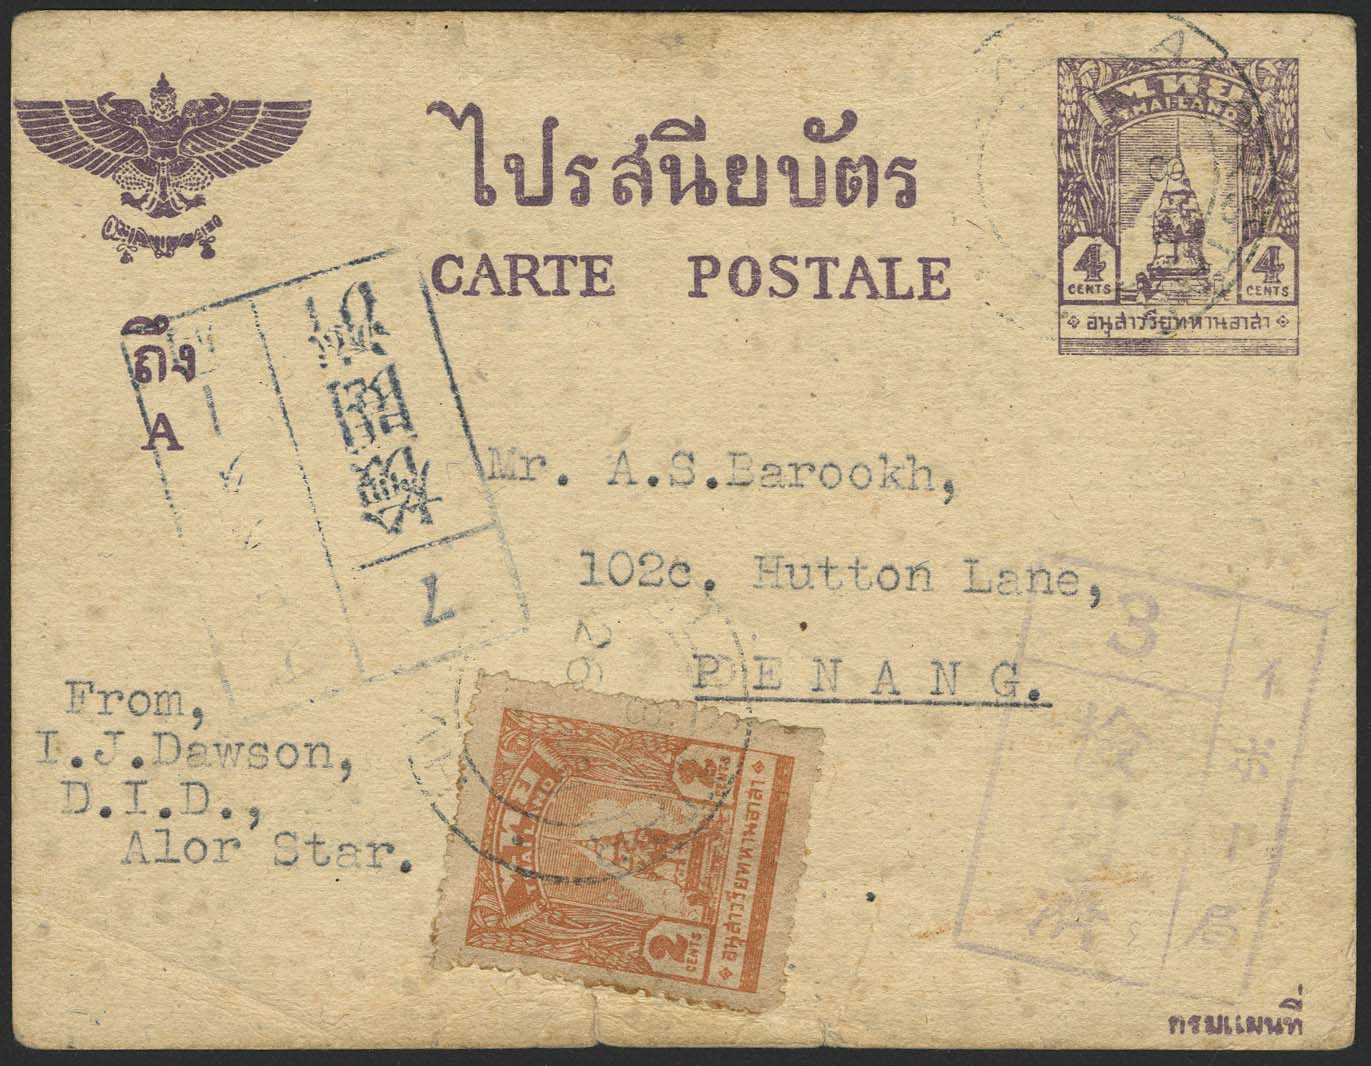 Lot 5135 - Übersee A-Z Thailand - Besetzung Malaya -  Auktionshaus Ulrich Felzmann GmbH & Co. KG